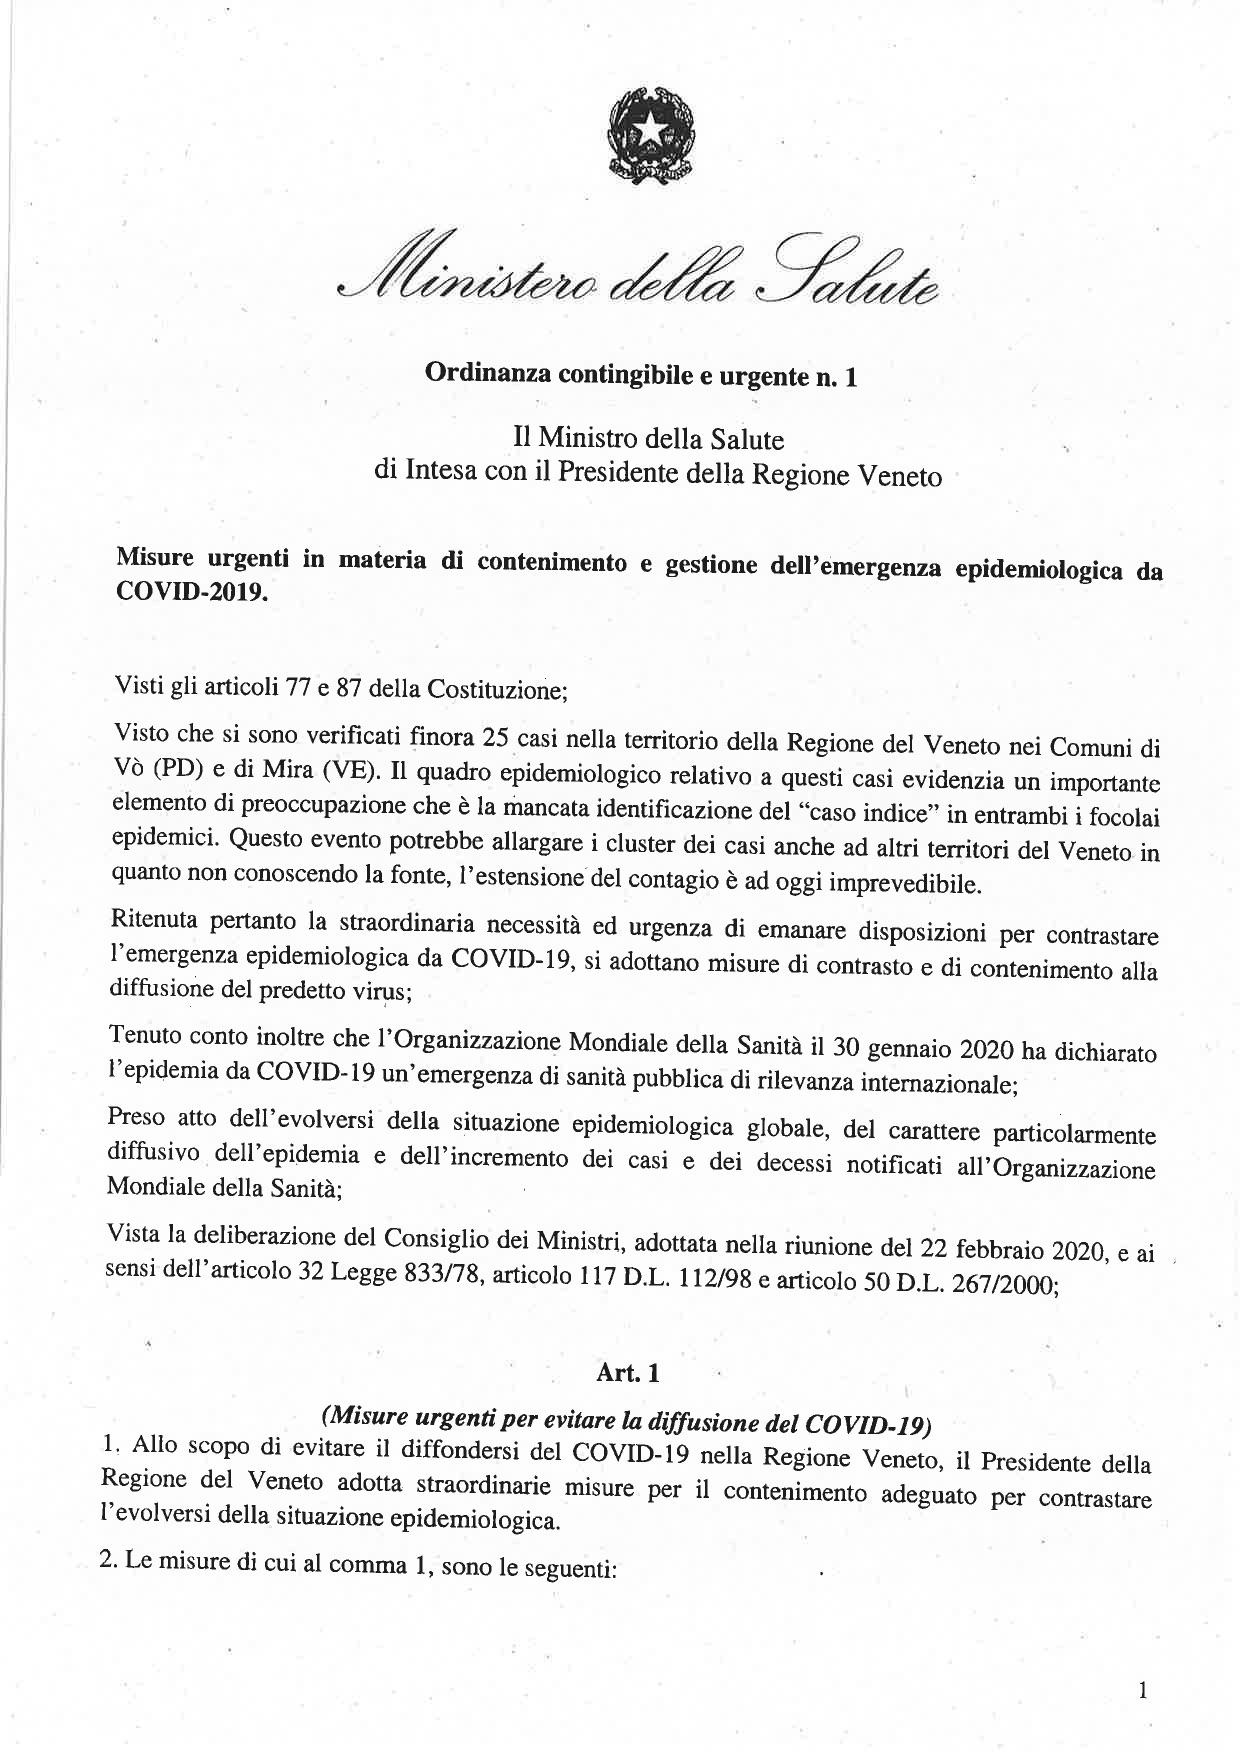 Ordinanza n. 1 23.02.2020 - 1